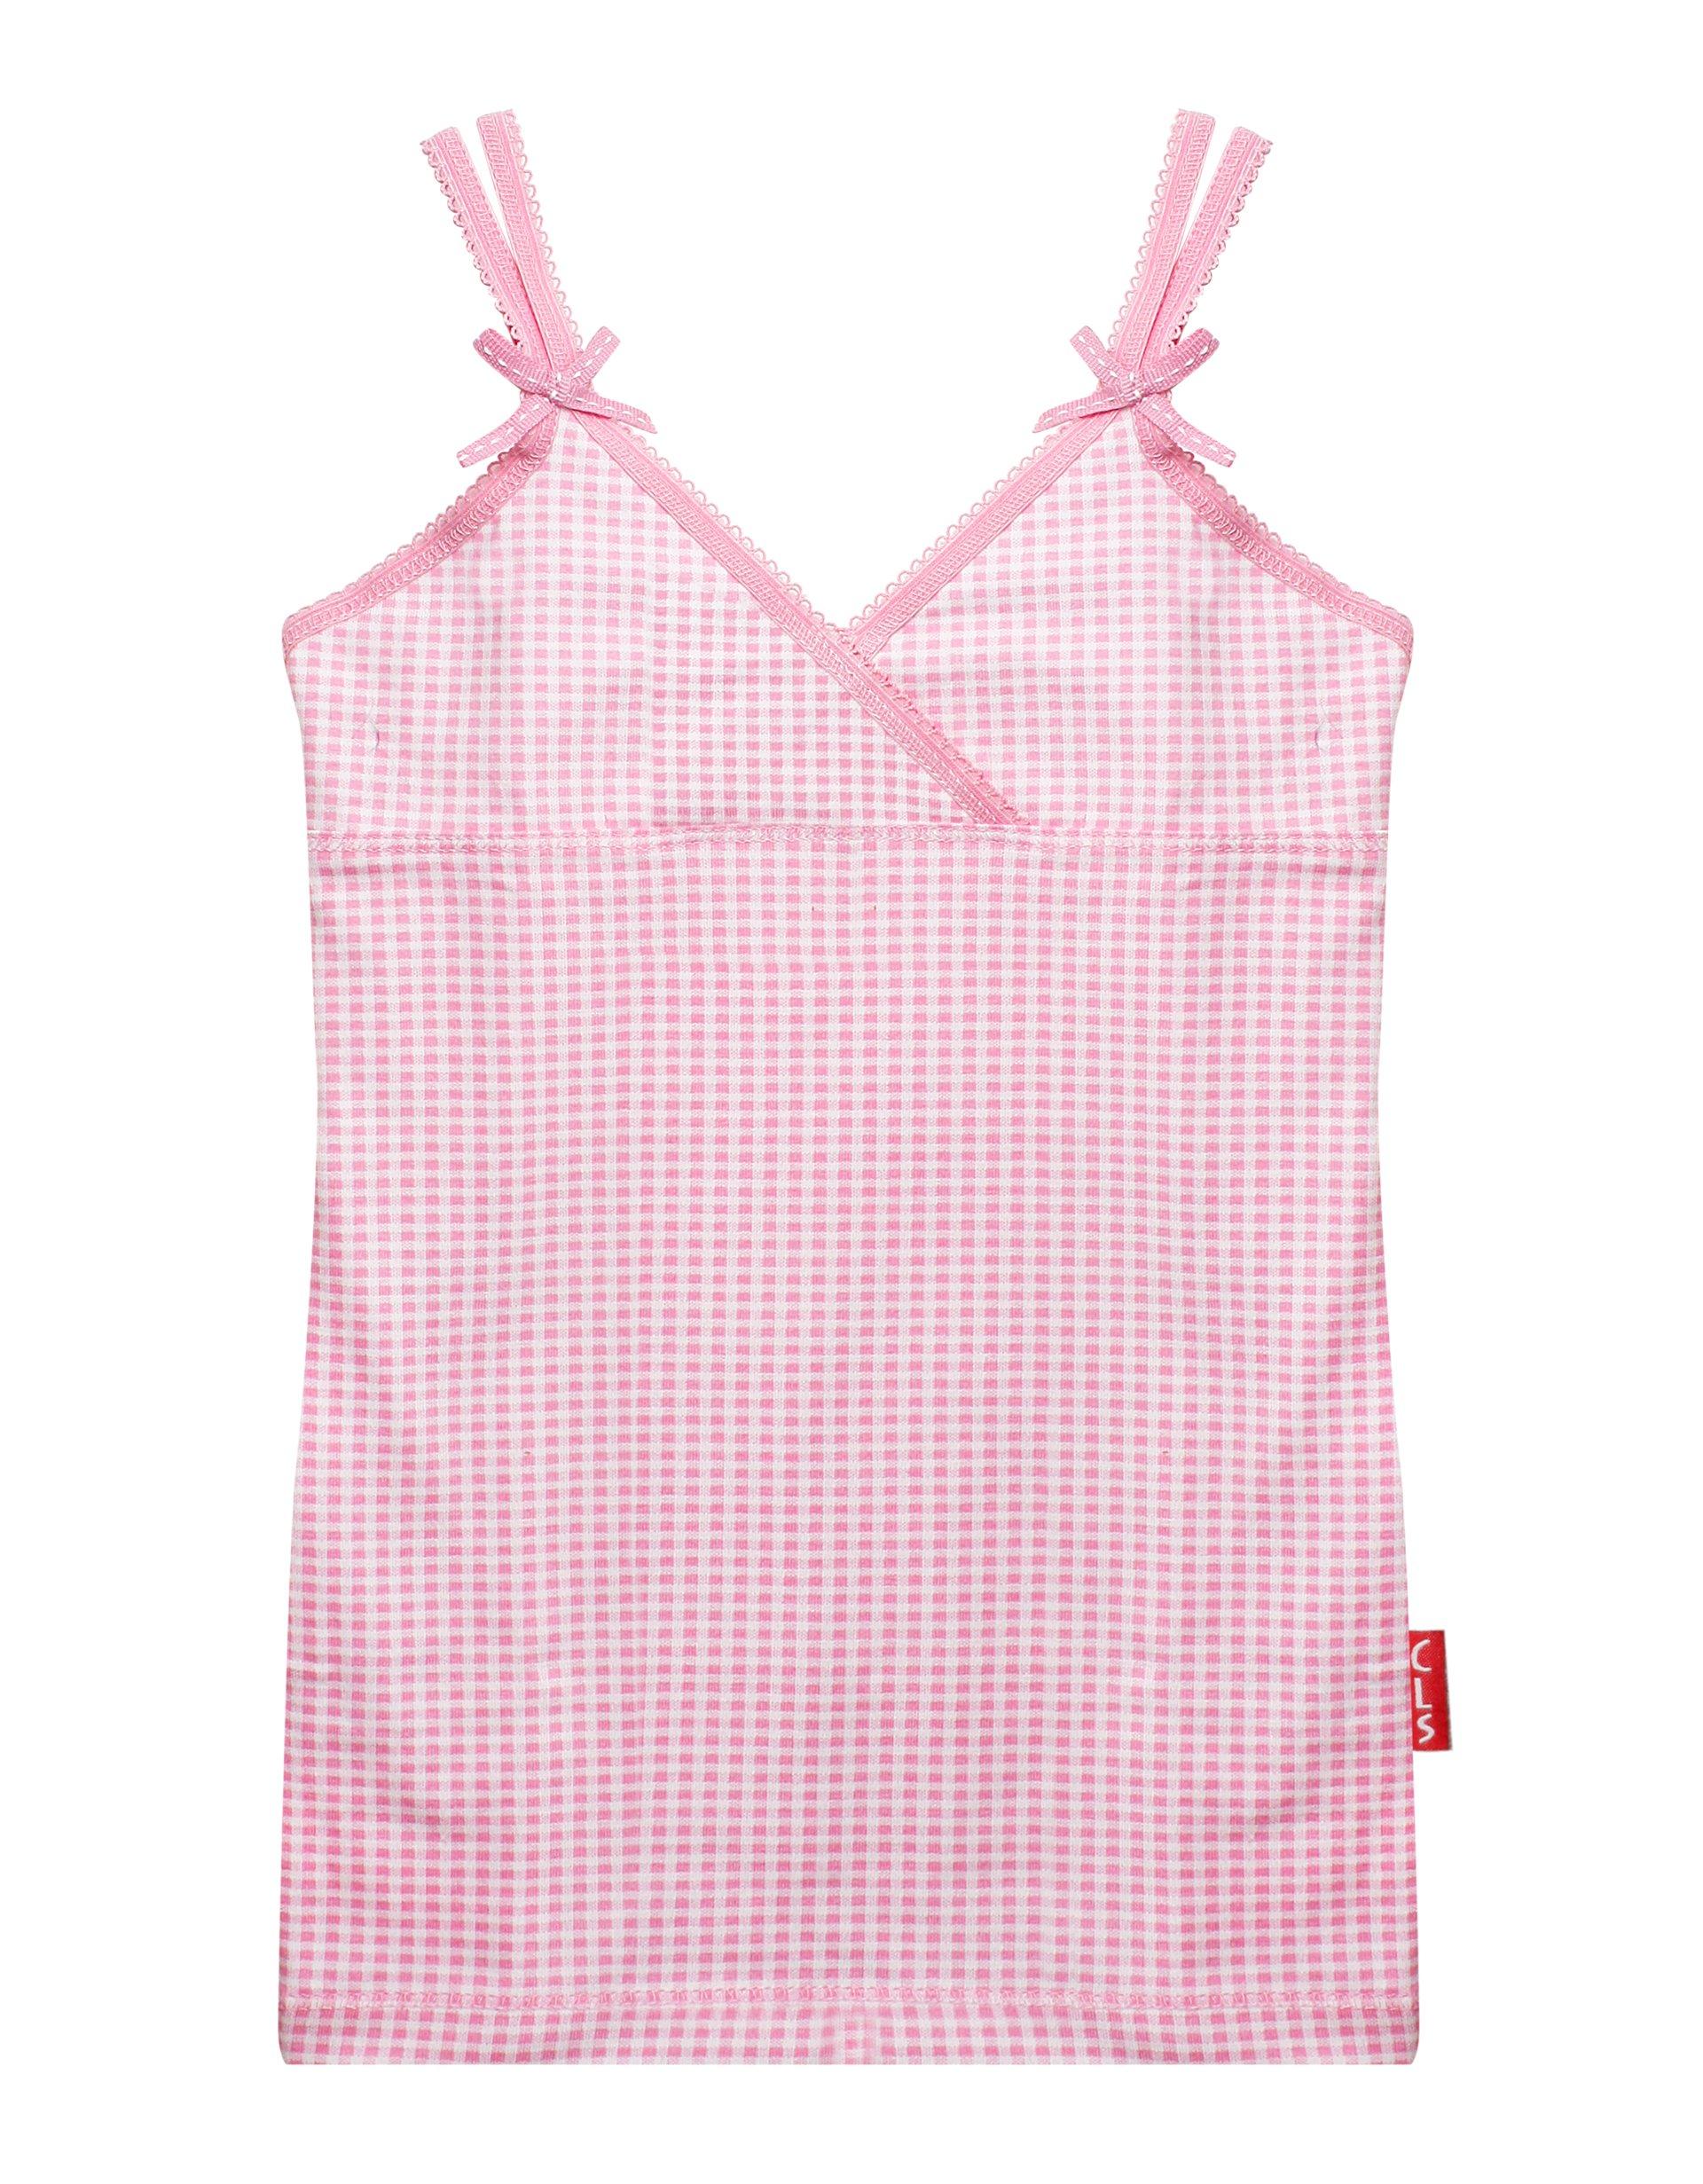 Singlet Small Pink Checks